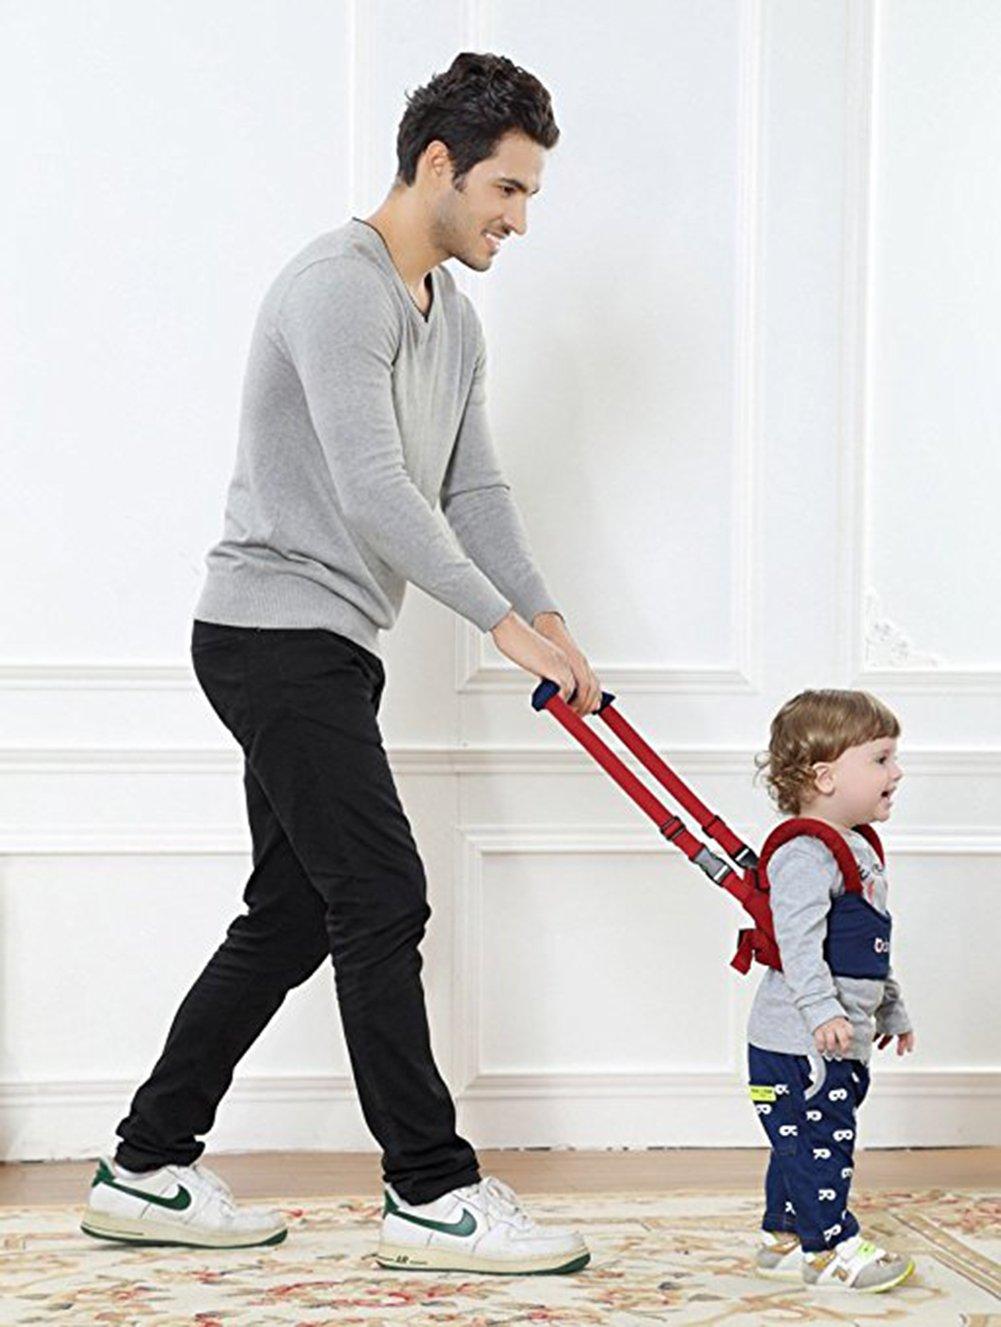 ZEAMO Handheld Baby Walker Toddler Walking Helper Safety Harnesses Learning Assistant Blue